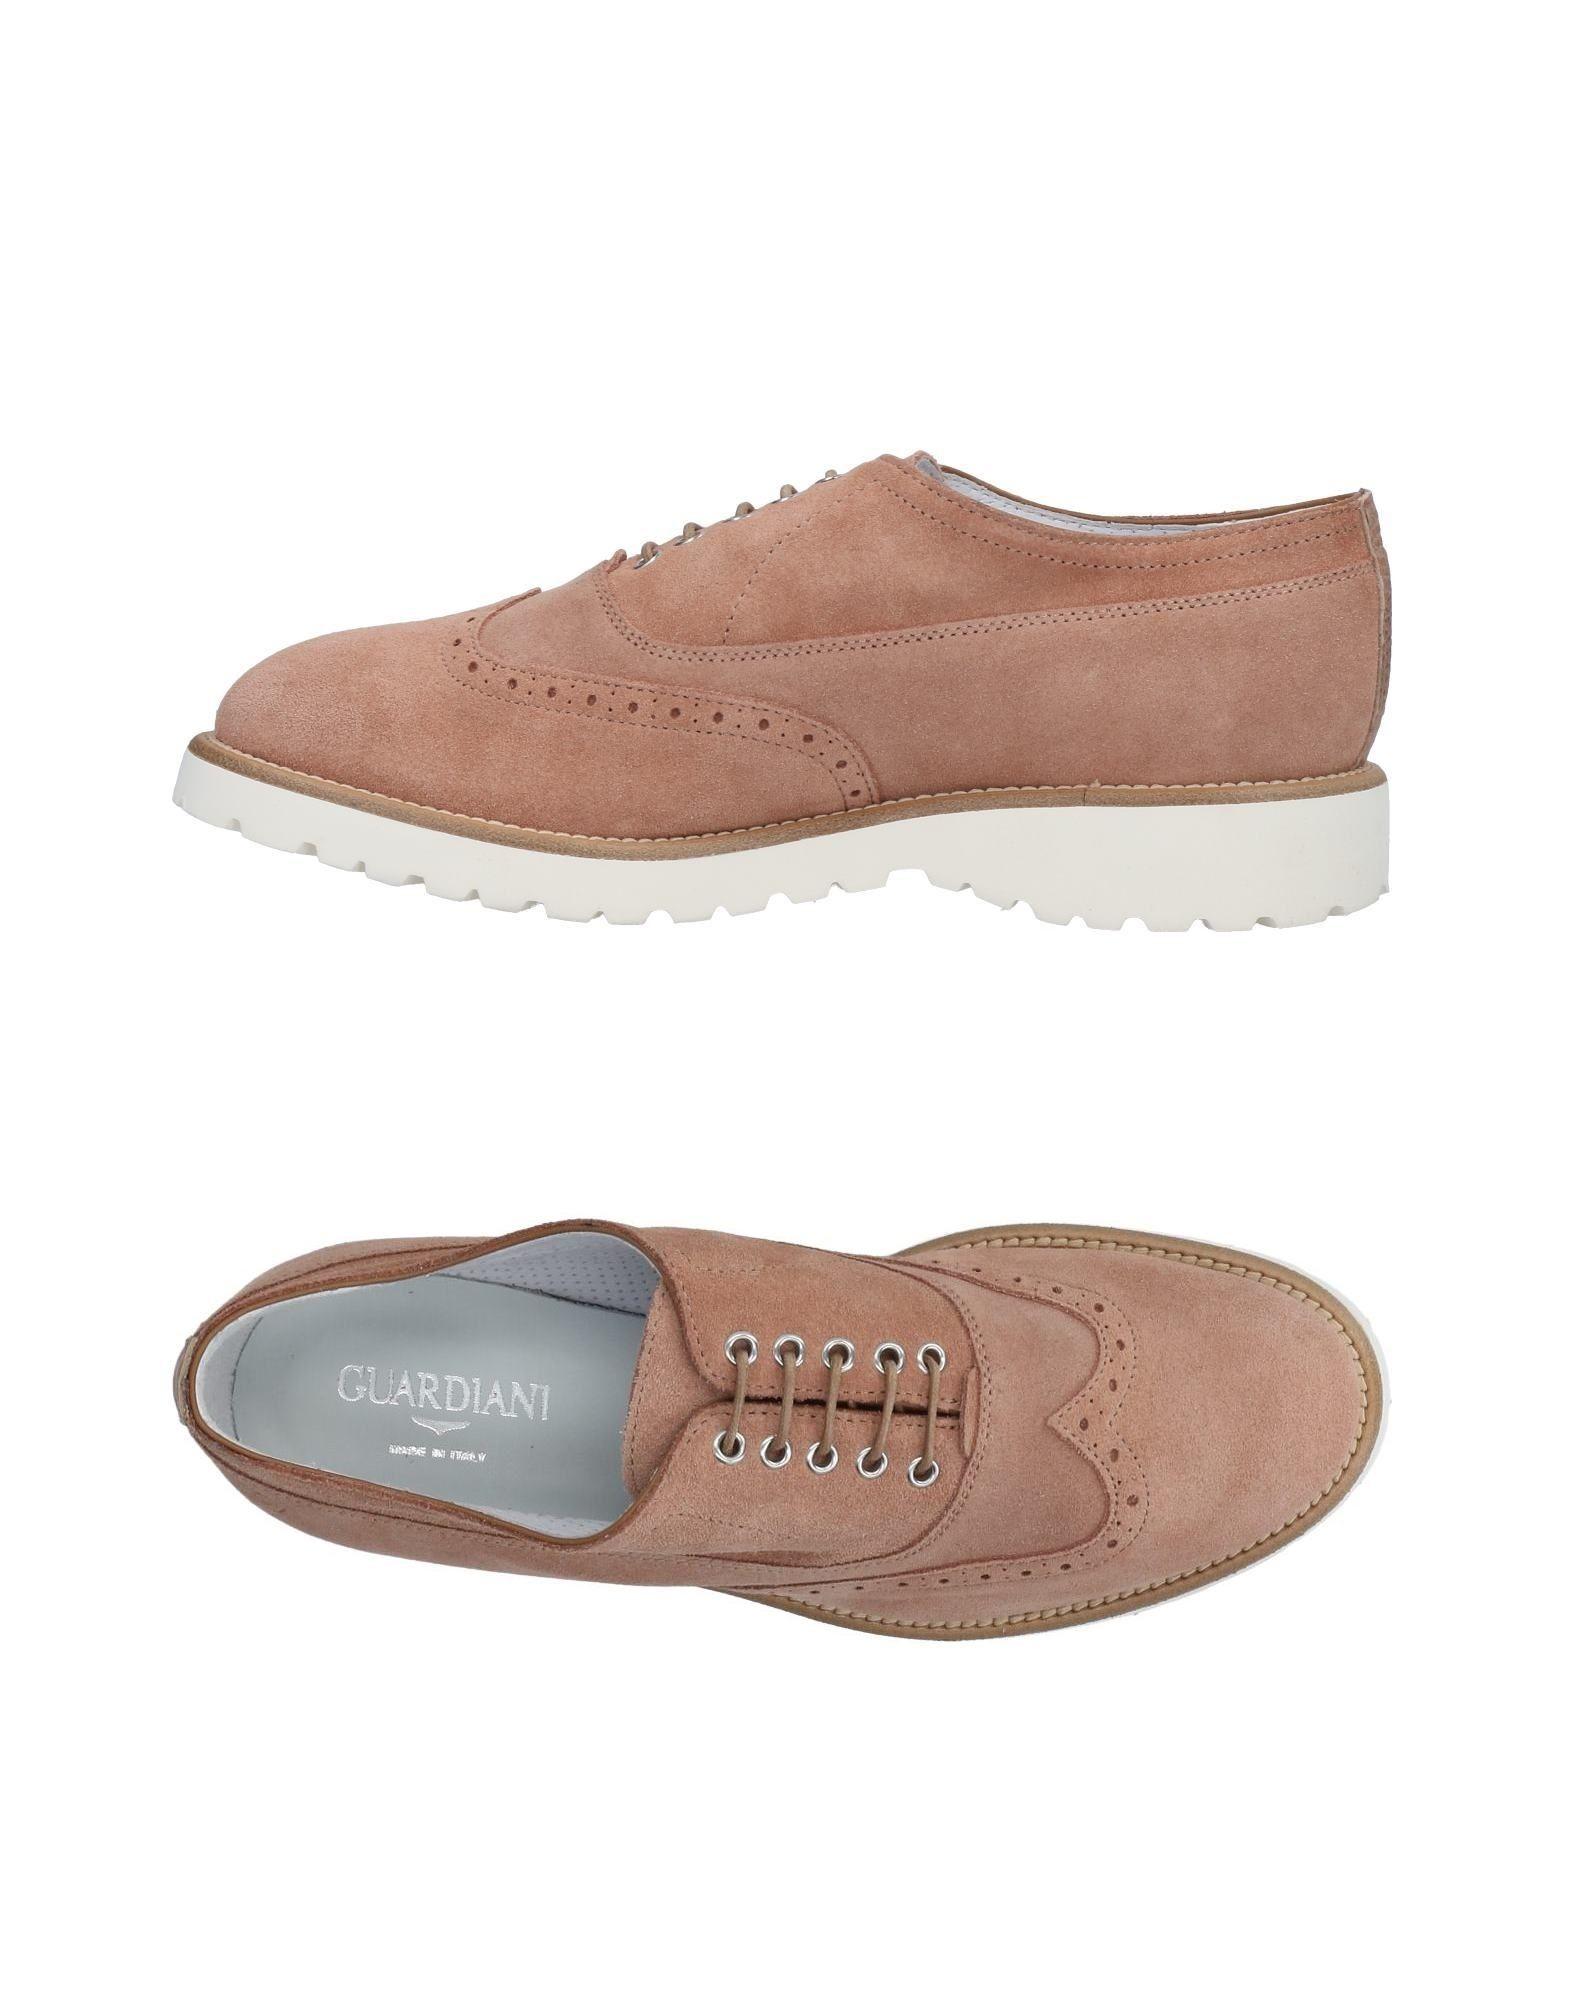 Alberto Guardiani Sneakers Damen  11478160FI Gute Qualität beliebte Schuhe